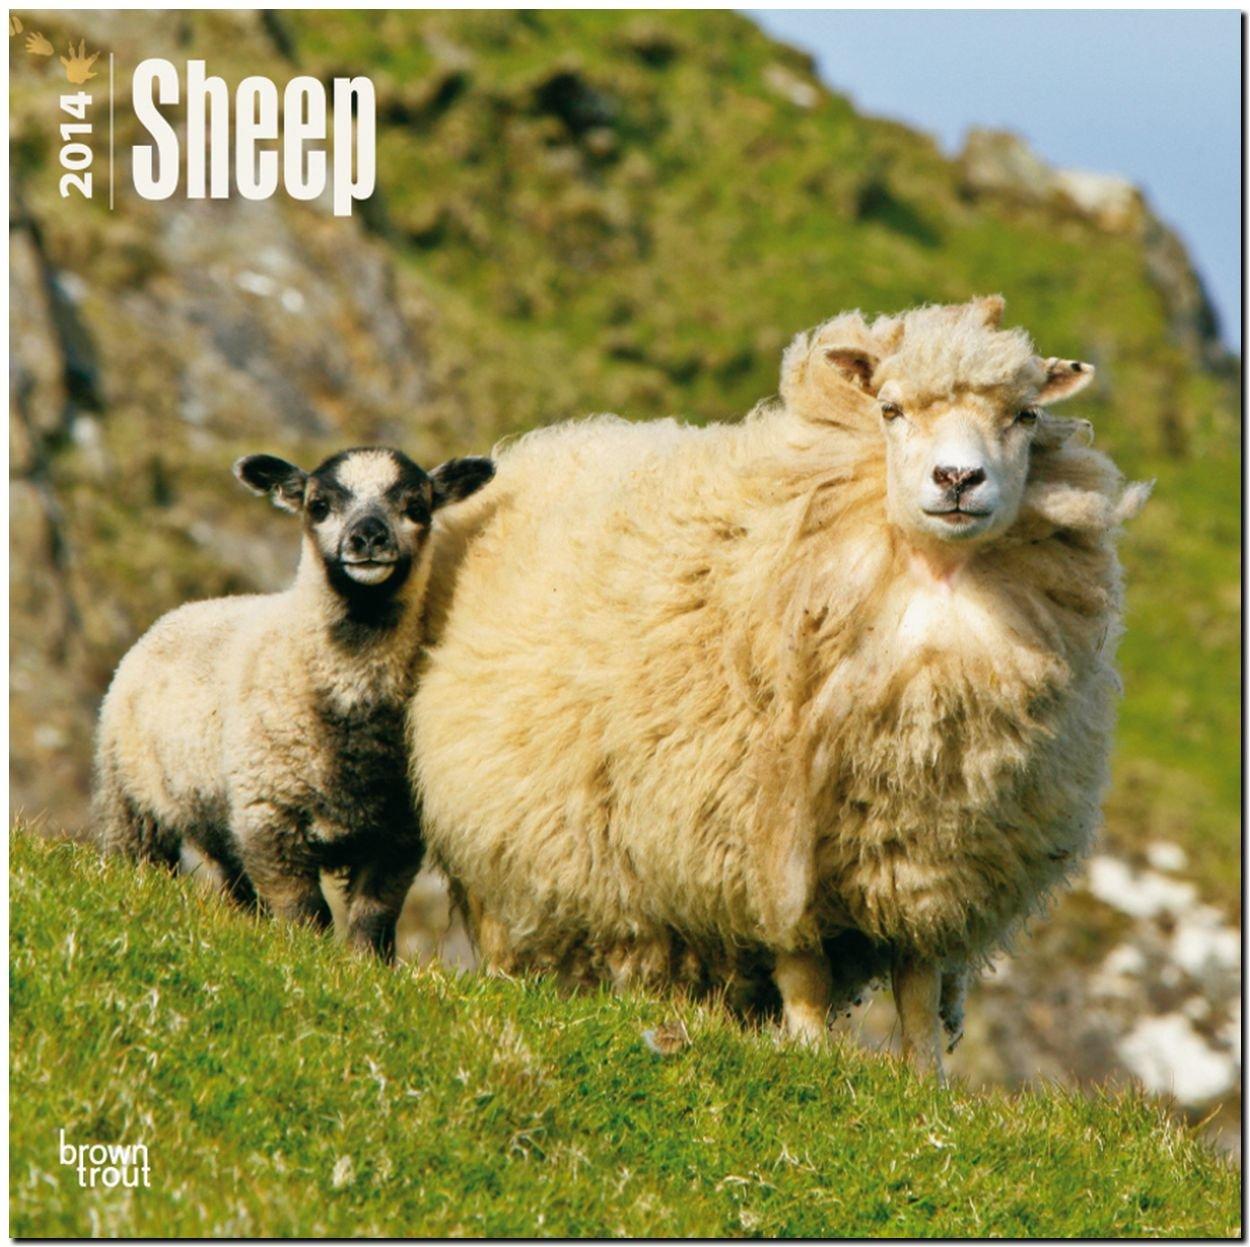 sheep-2014-schafe-original-browntrout-kalender-mehrsprachig-kalender